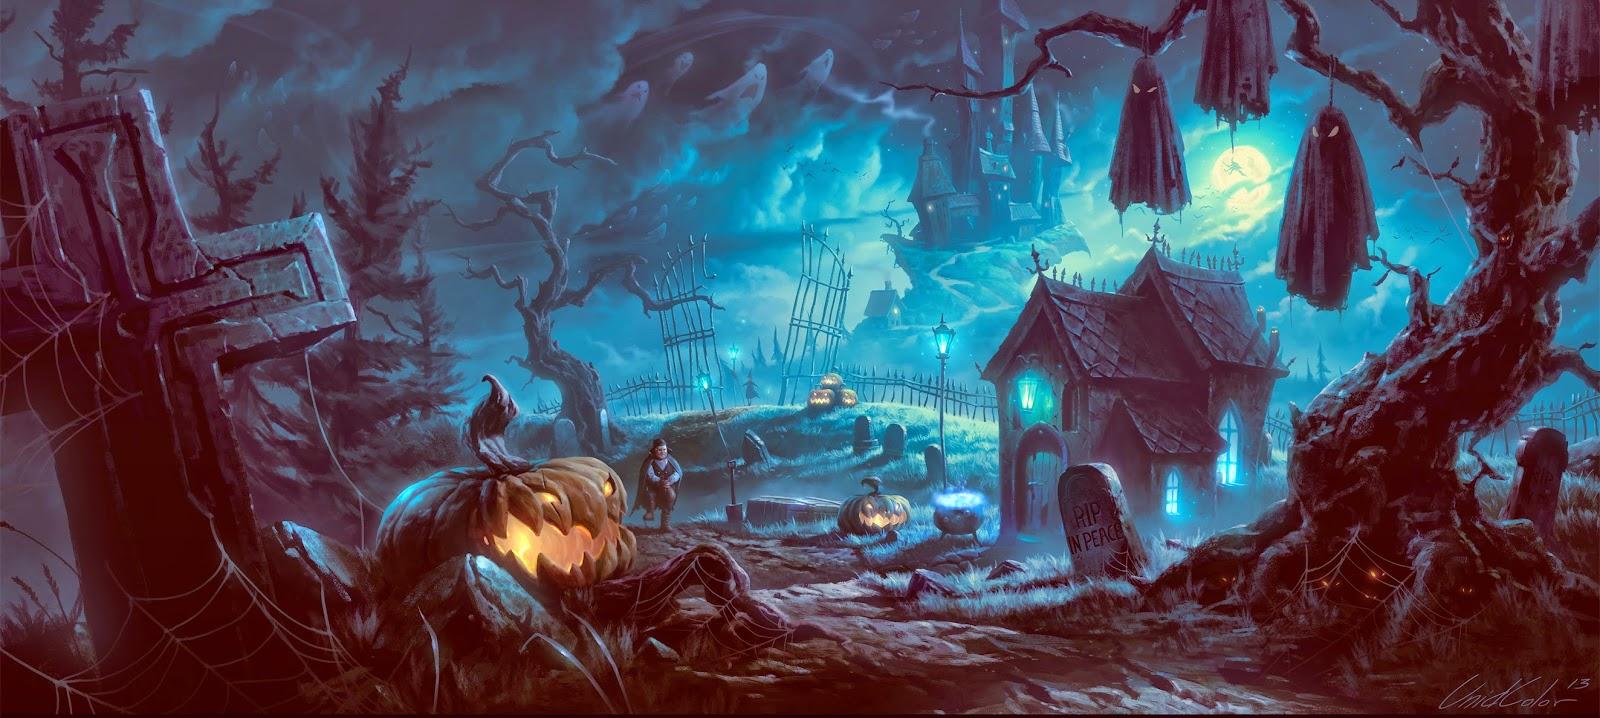 Haunted House ? Wallpapers: Harvest Time Desktops / free Horror ...